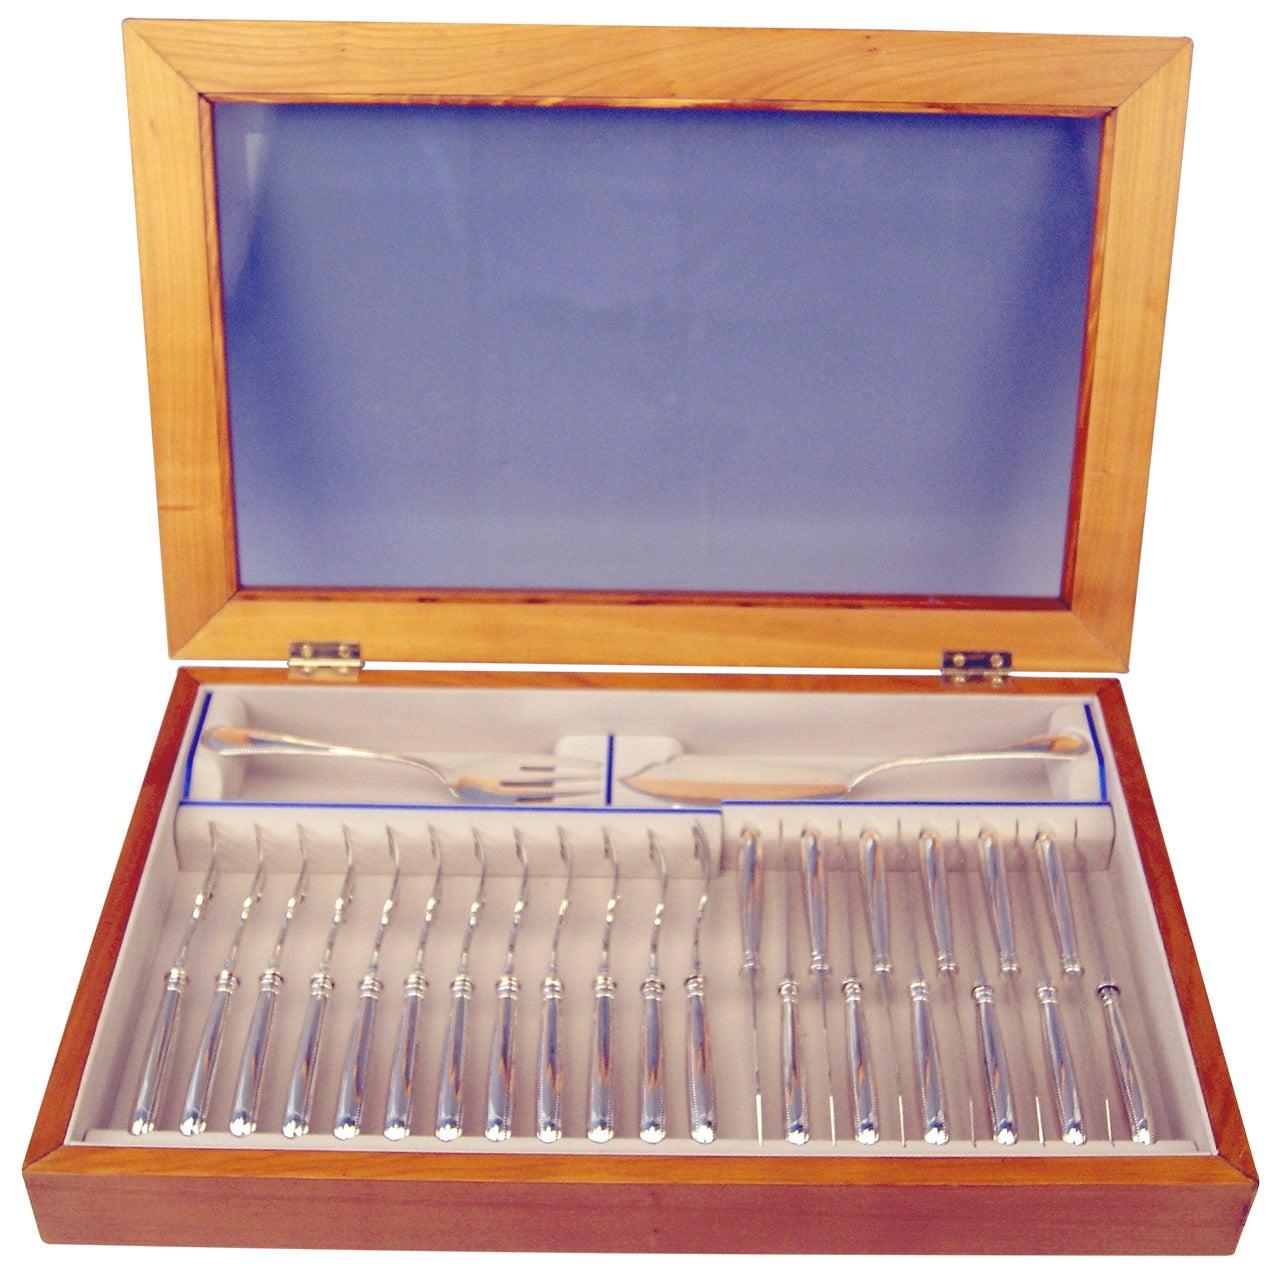 Silver 26-Piece Flatware Fish Cutlery 12 Persons Koch & Bergfeld Germany c.1900